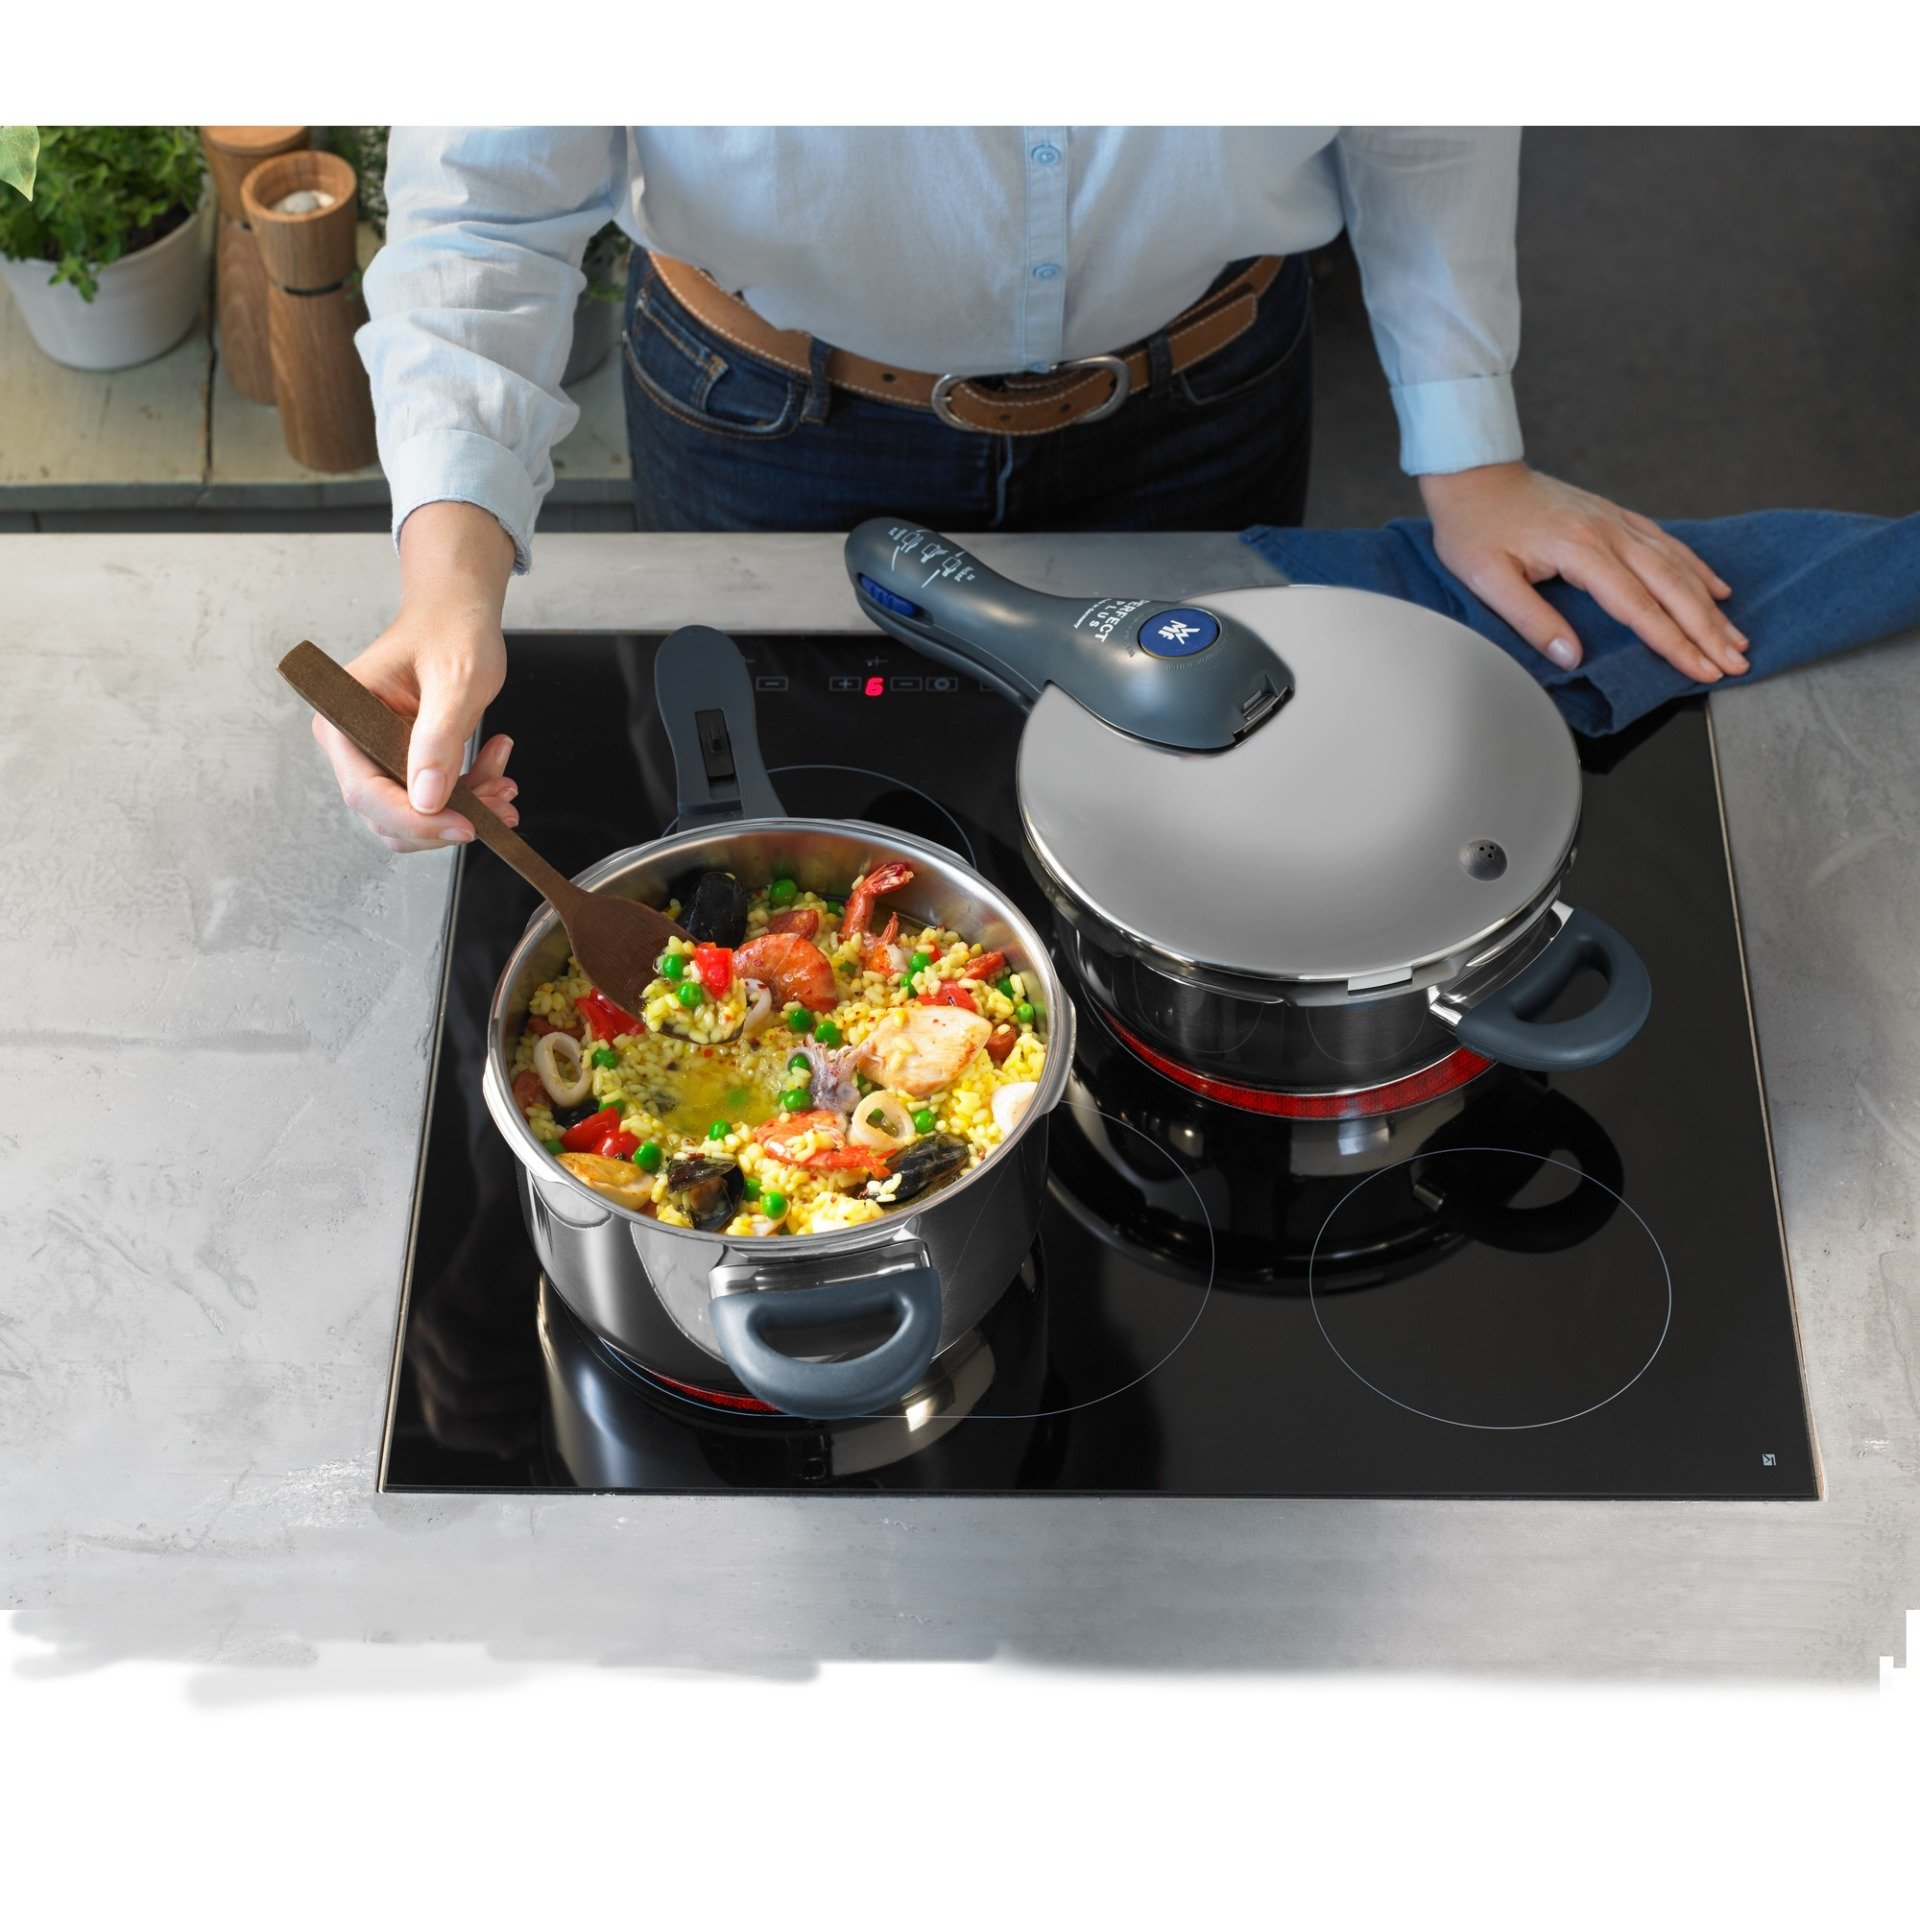 Articoli da cucina trento franzinelli casalinghi - Articoli da cucina ...